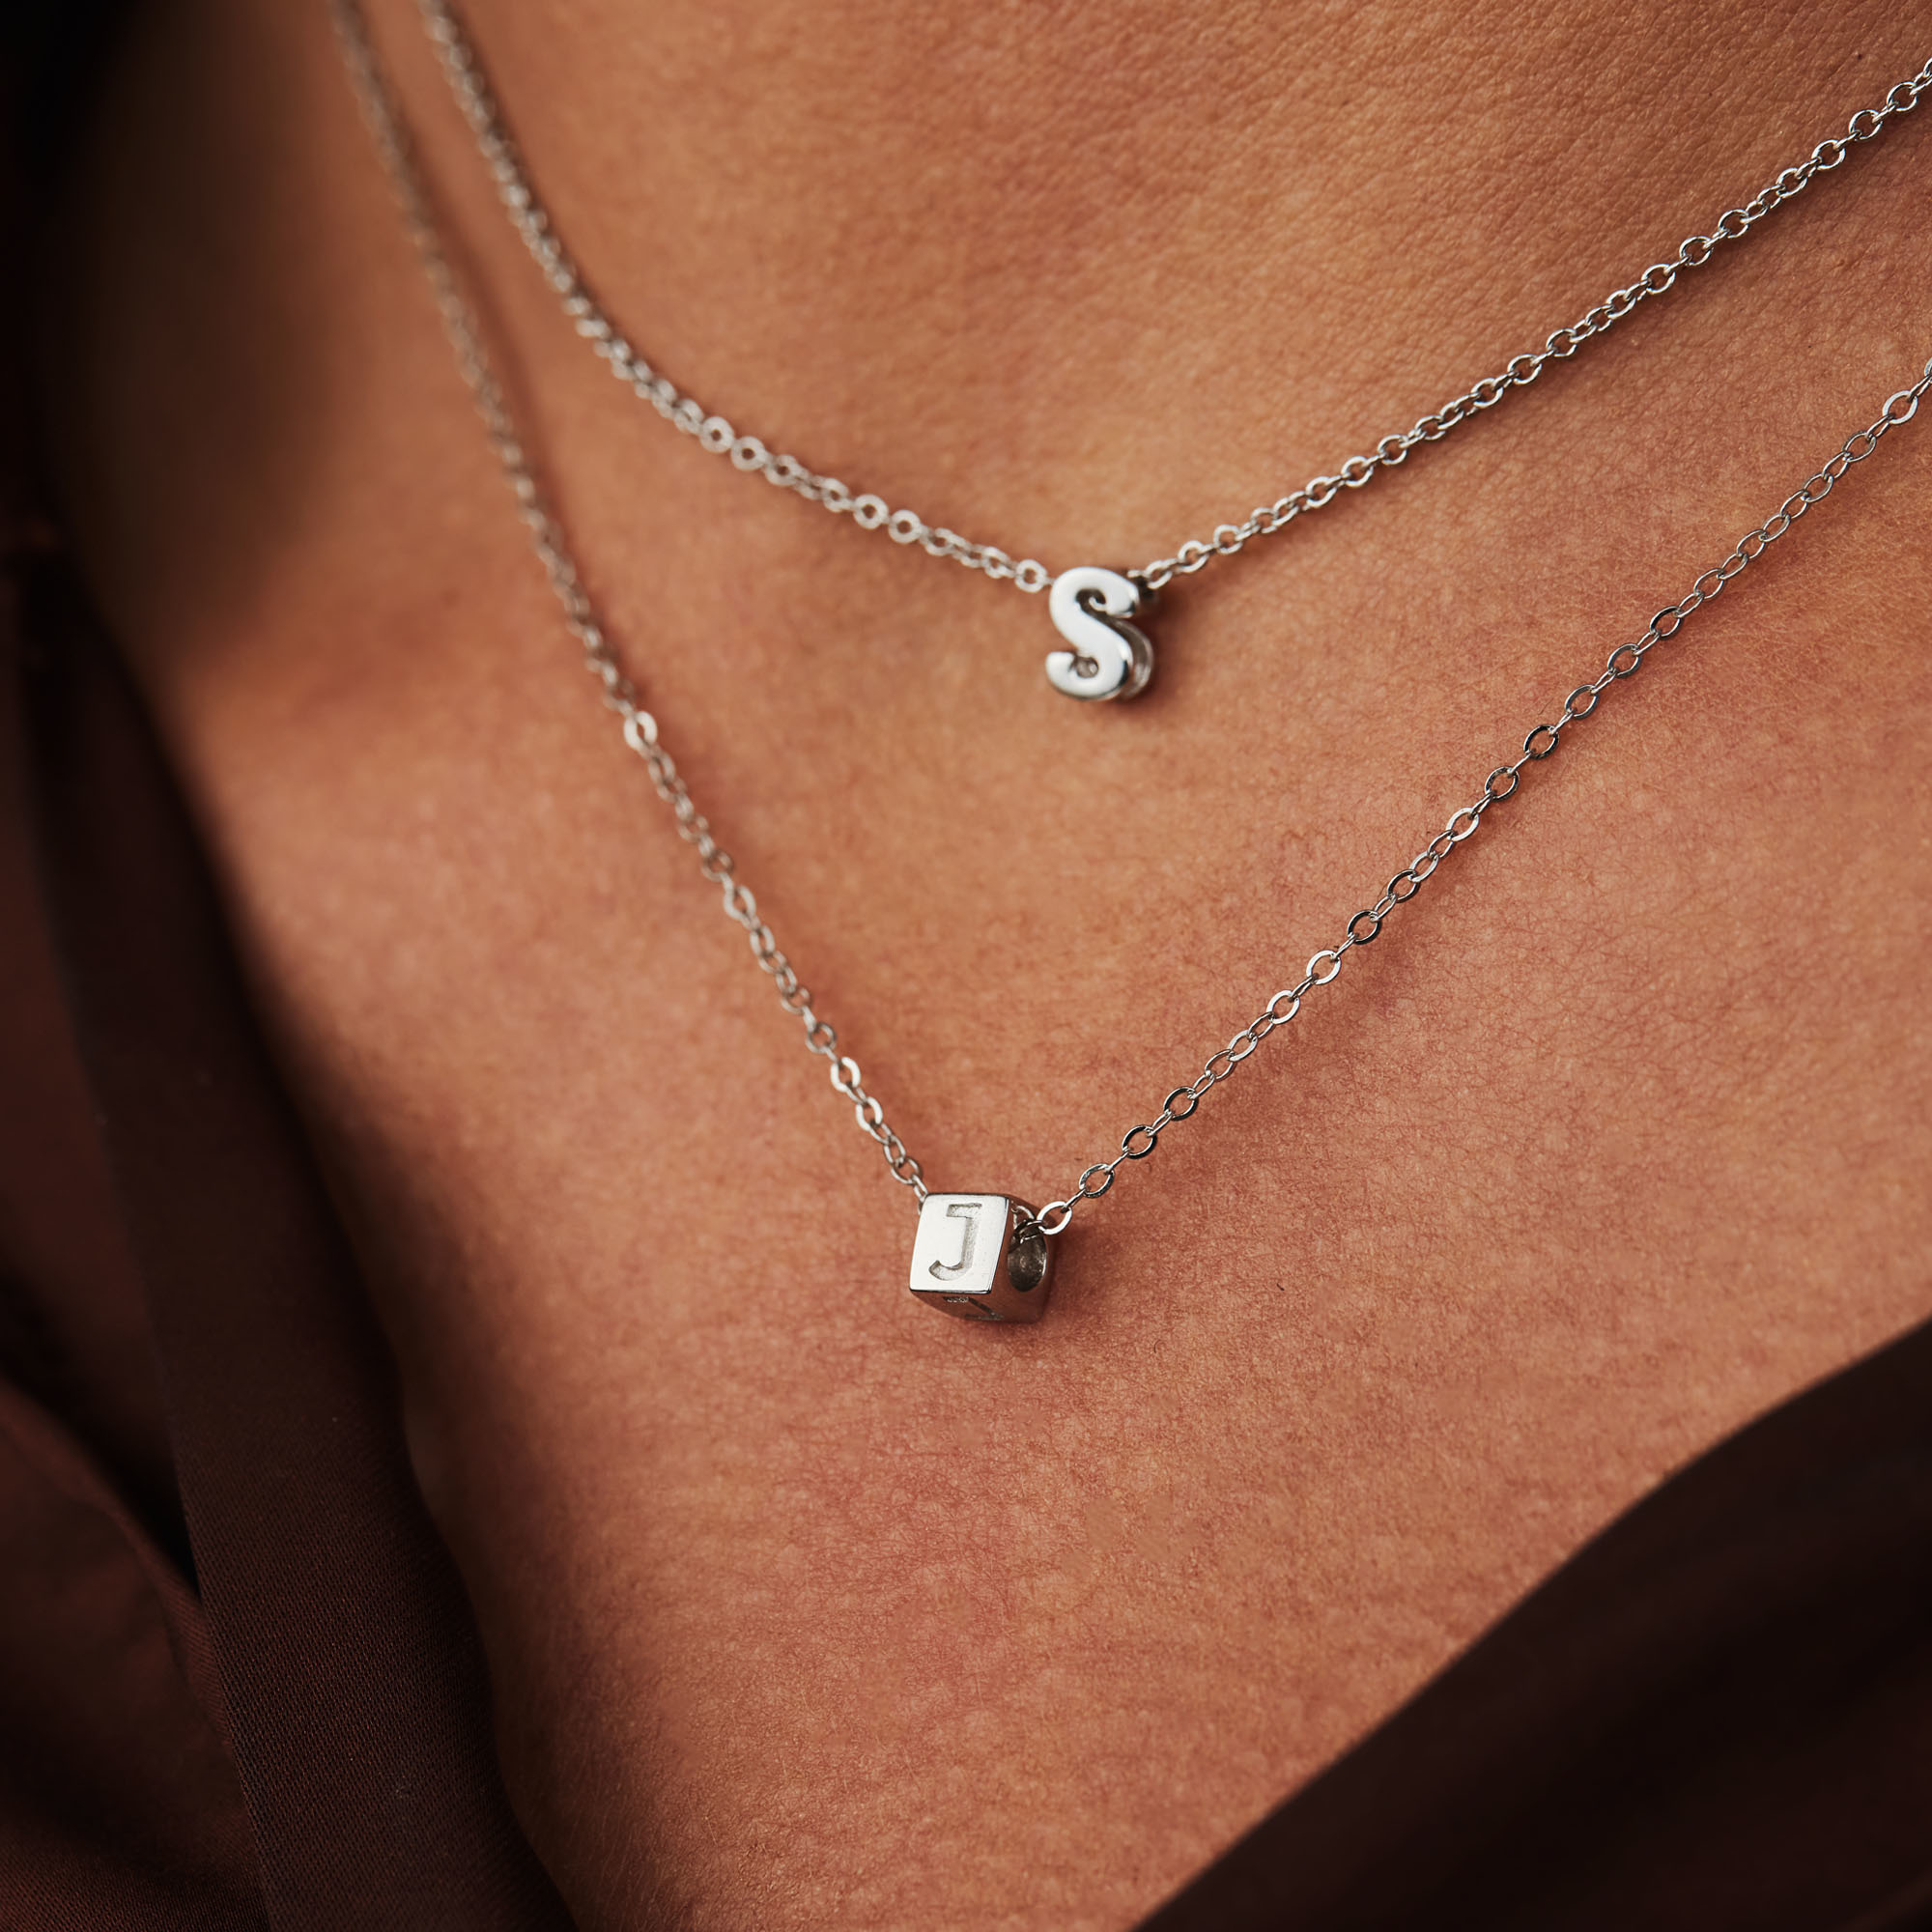 Selected Jewels Julie Chloé 925 sterling zilveren initial ketting met letter